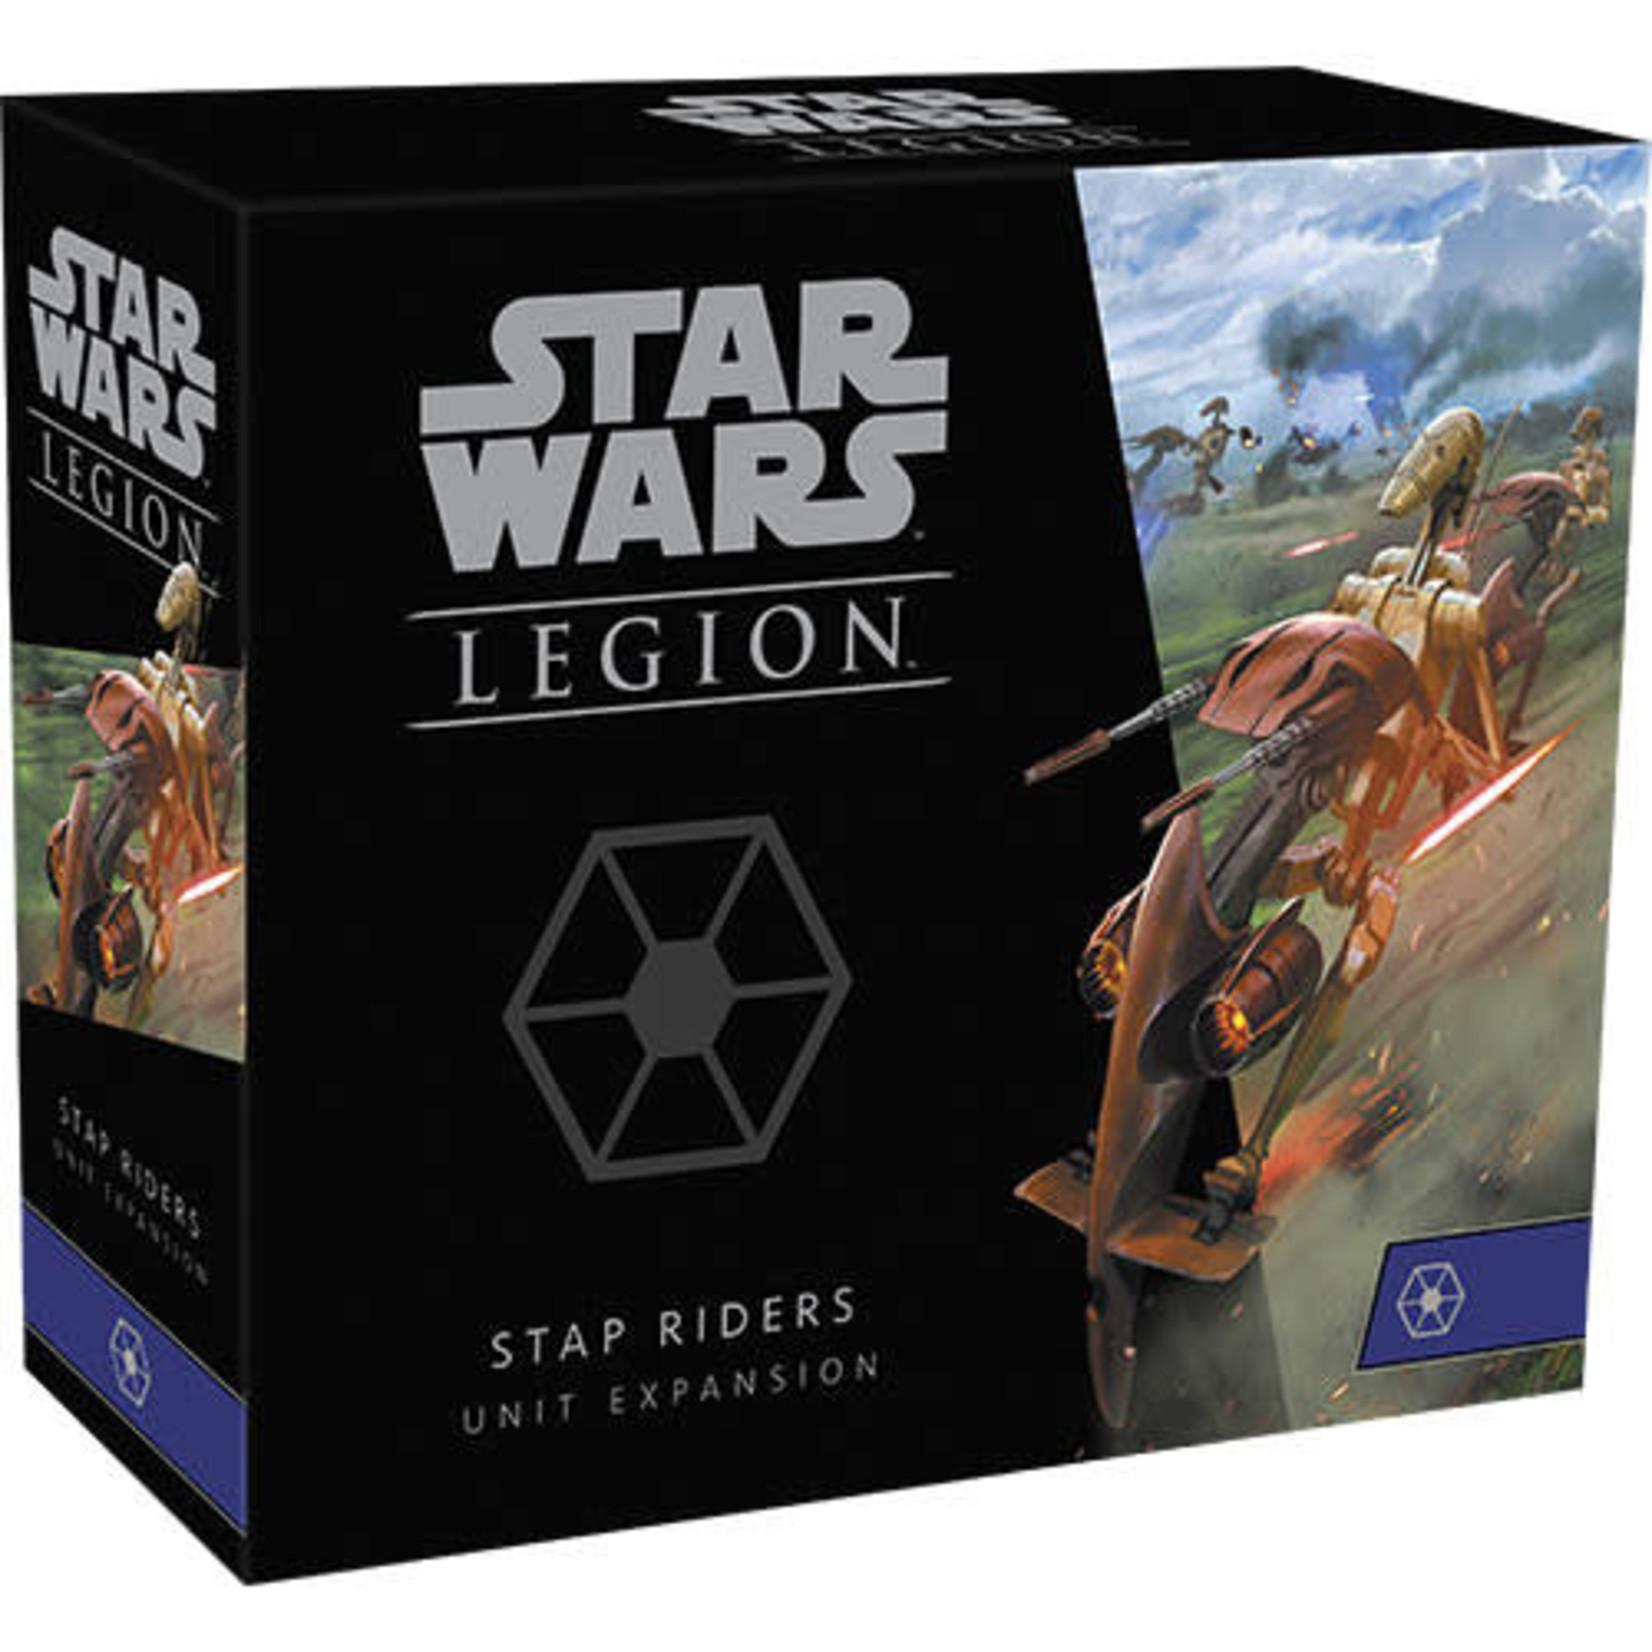 Star Wars Legion STAP Riders Unit Expansion